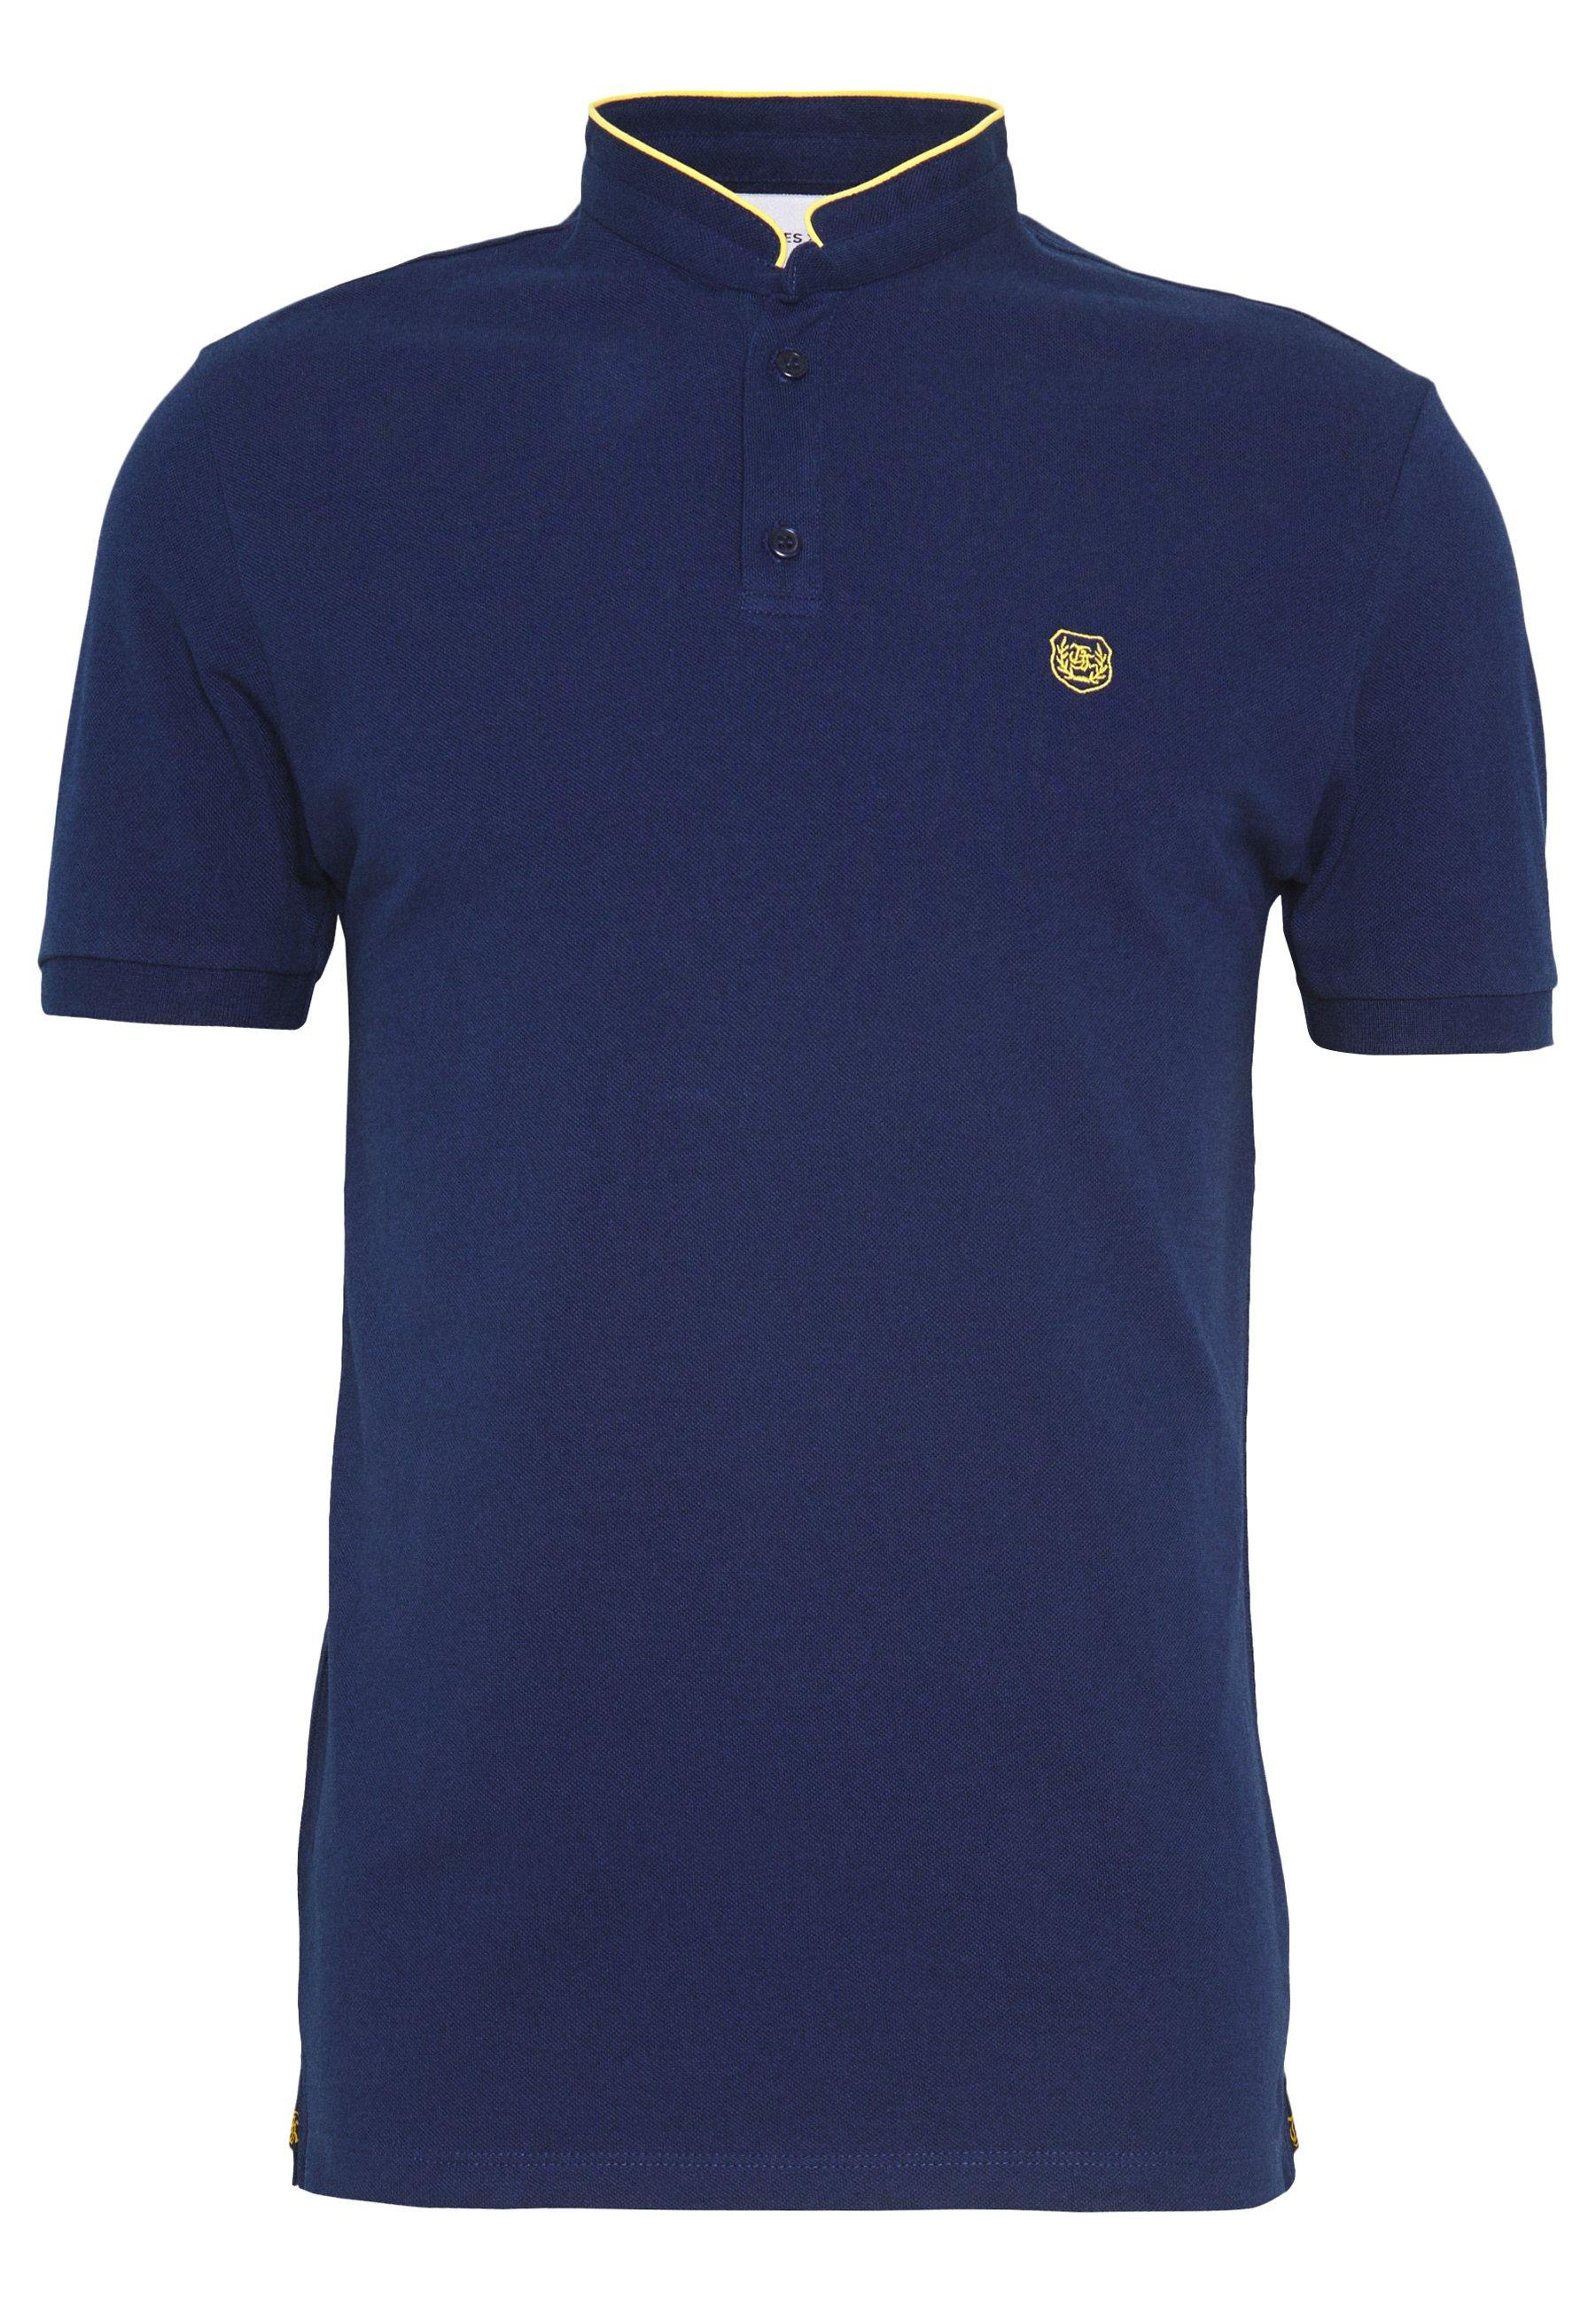 The Kooples T-shirt basique - officer navy/dandelion yellow